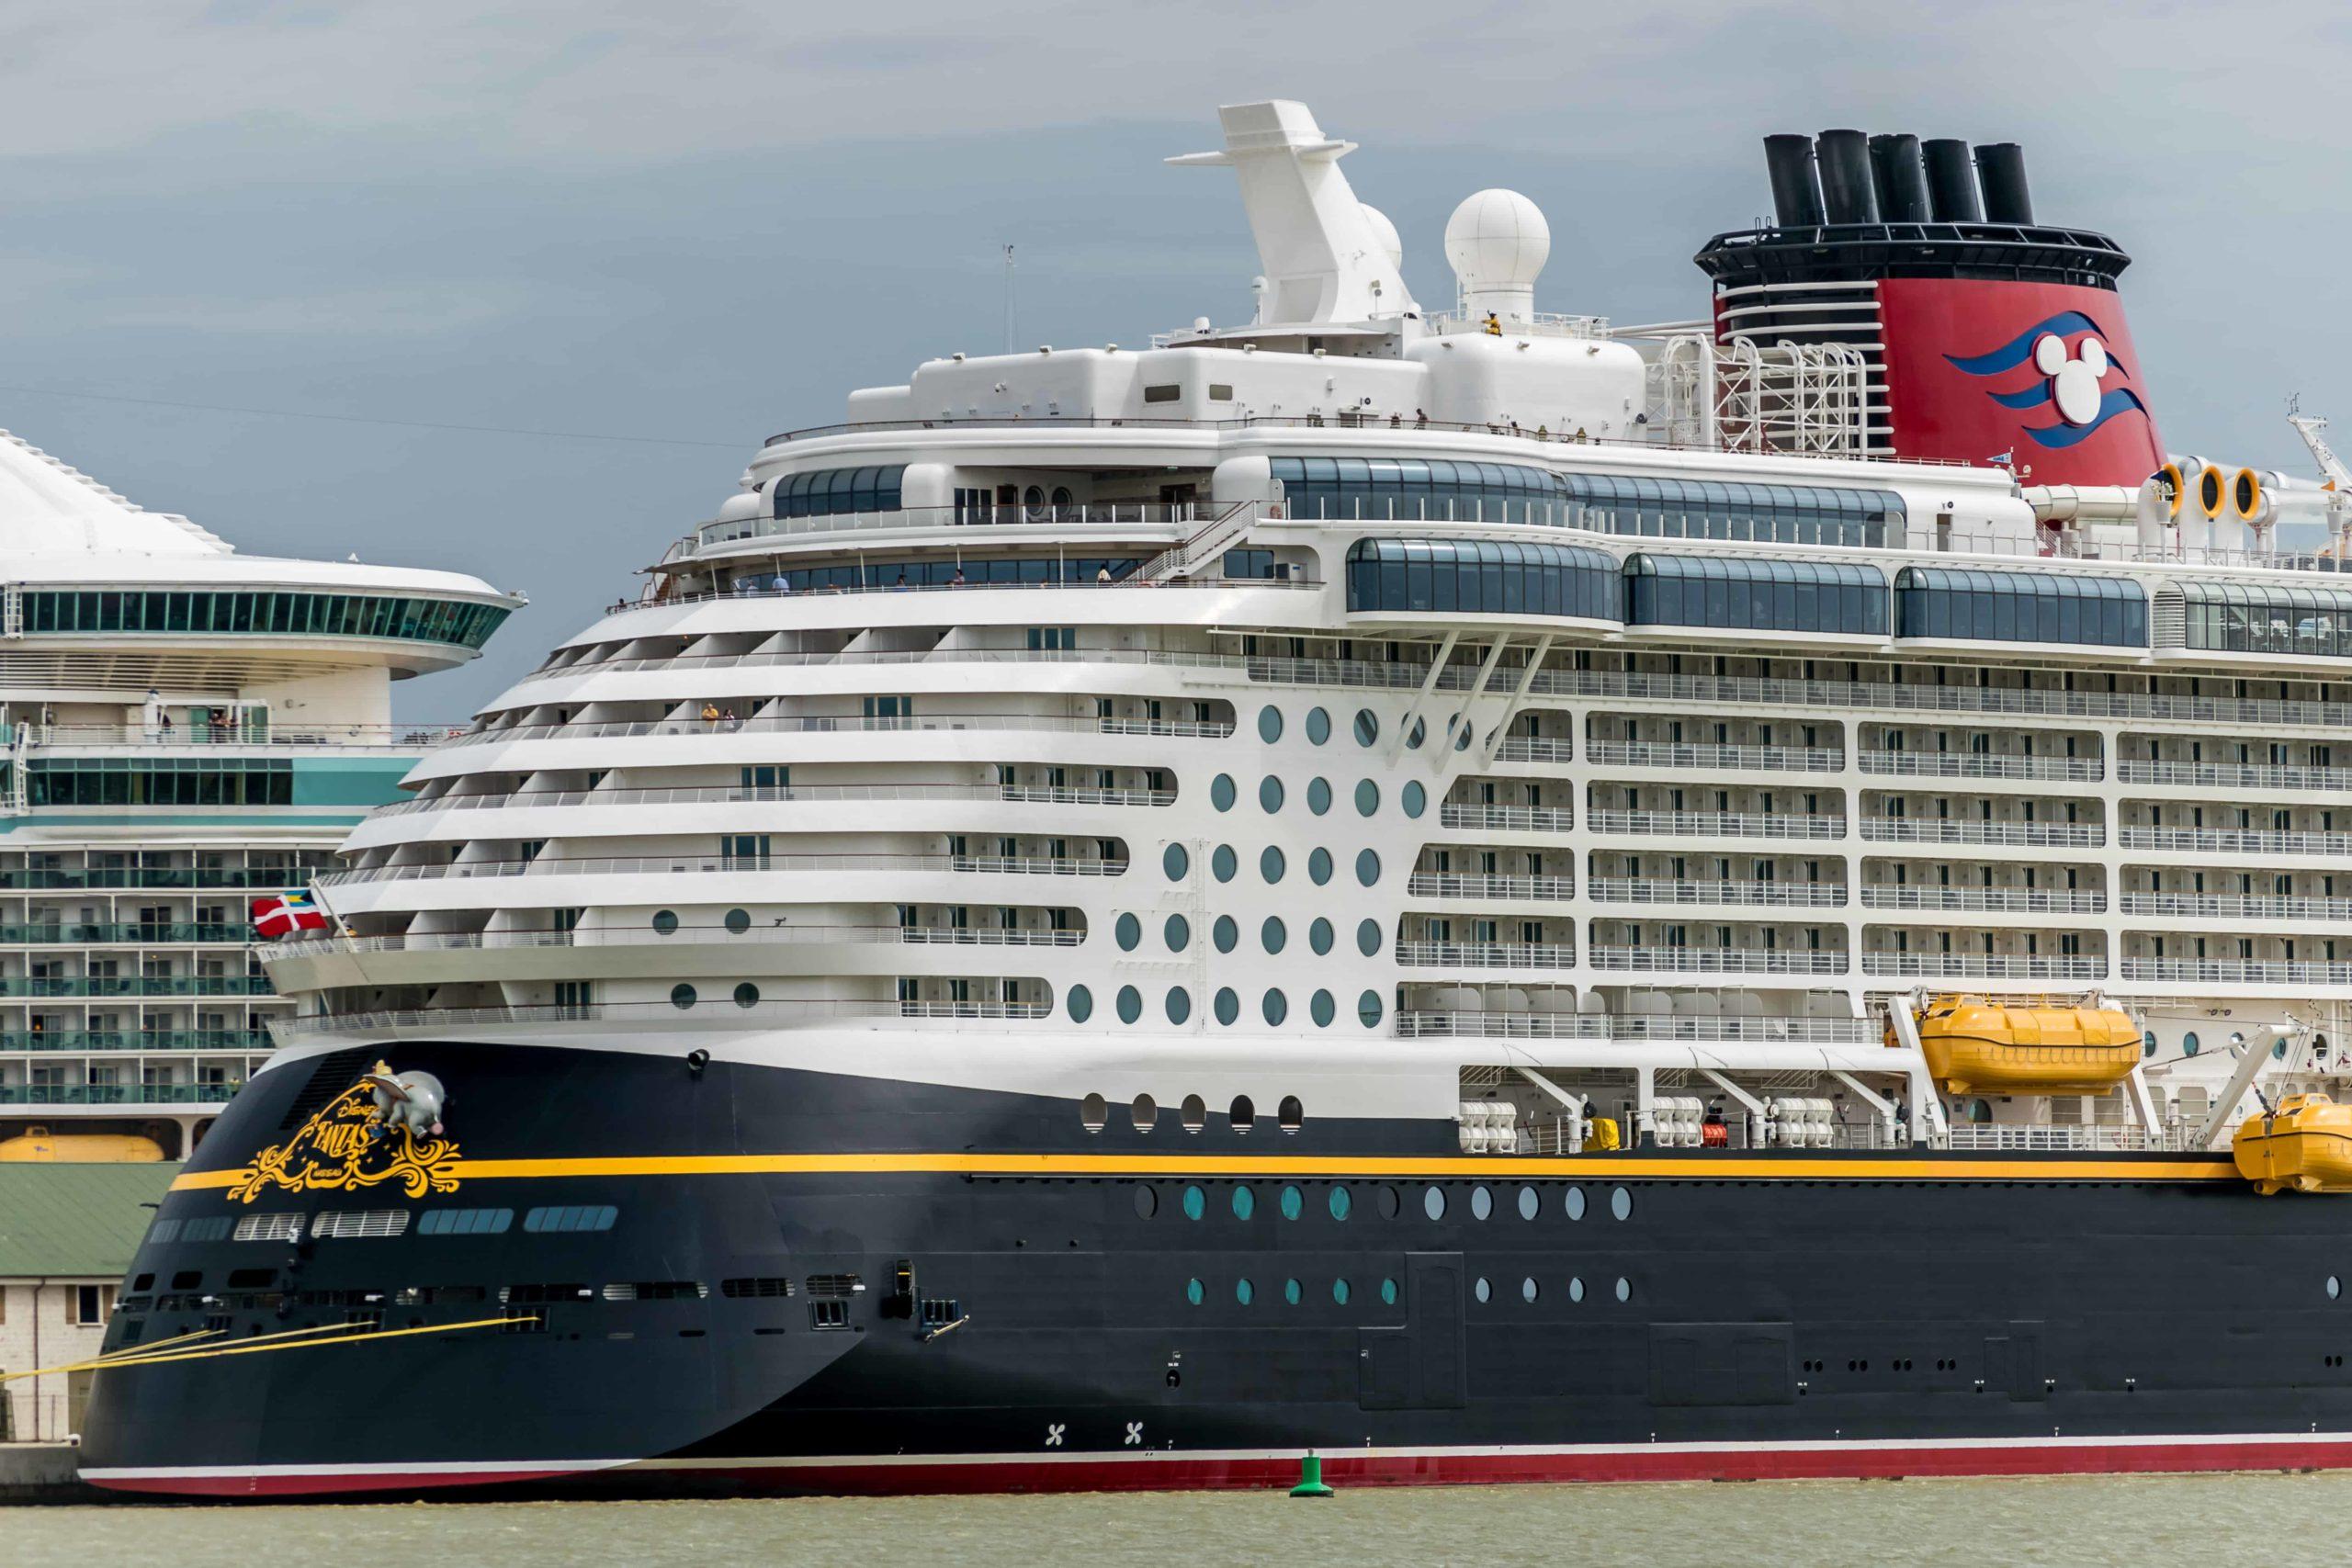 Disney Fantasy Cruise Cost Summer 2022